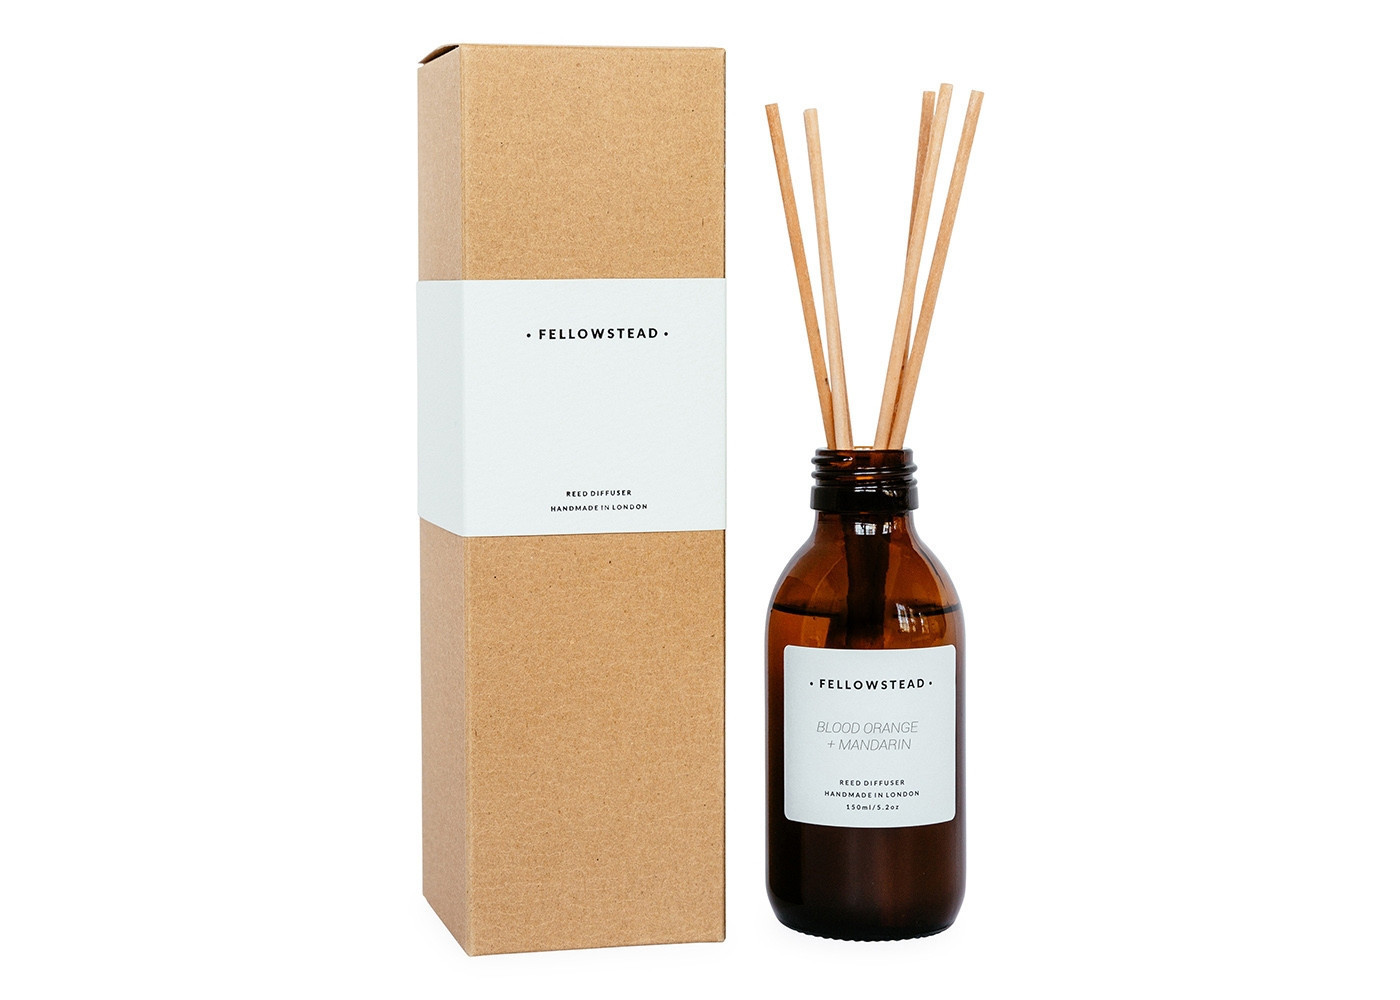 Fellowstead Essential Oil Diffuser - Blood Orange + Mandarin